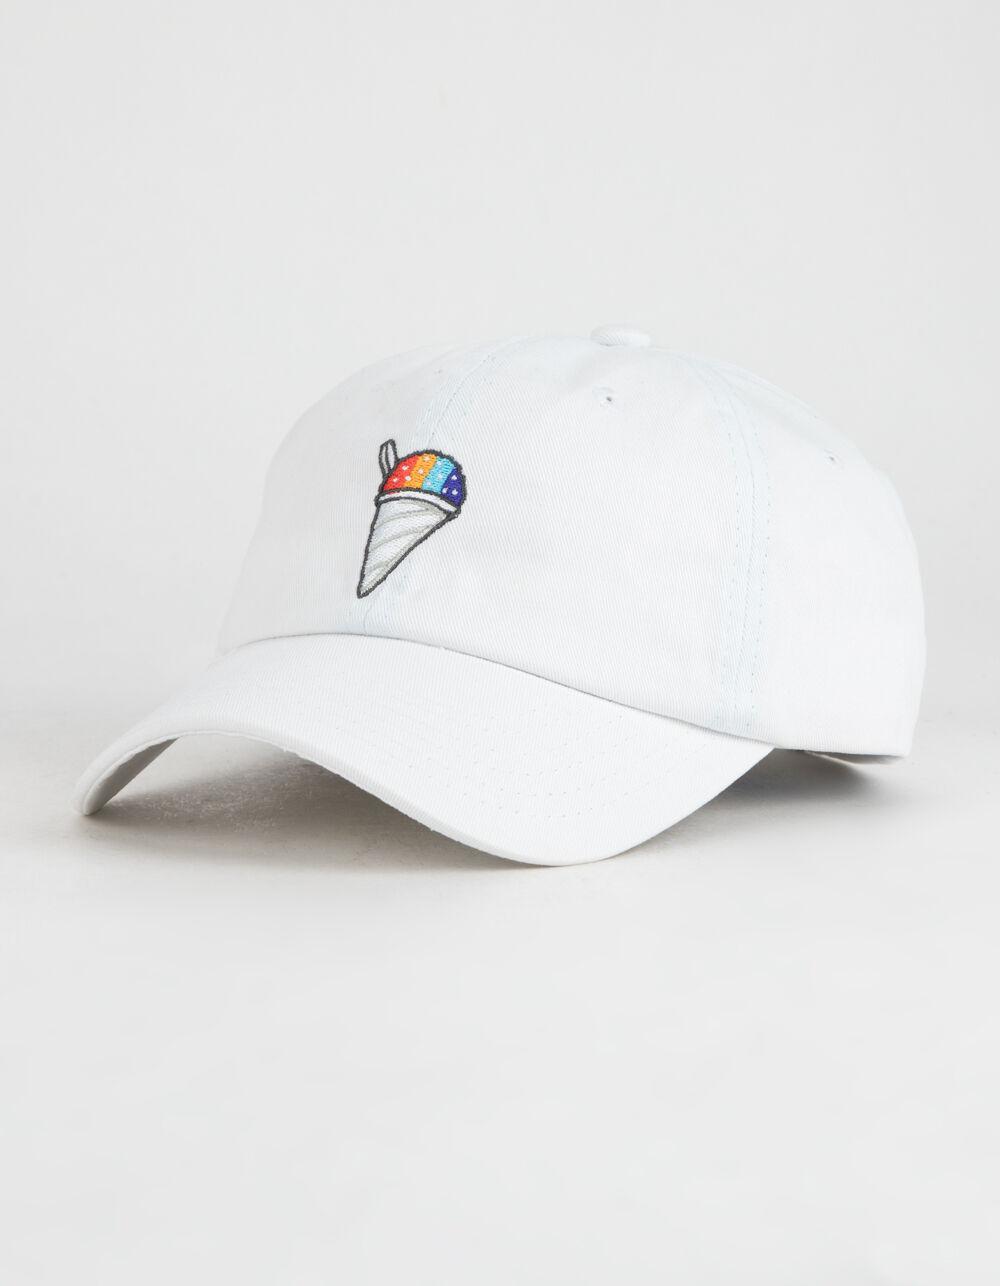 Image of DGK ICEY WHITE STRAPBACK HAT